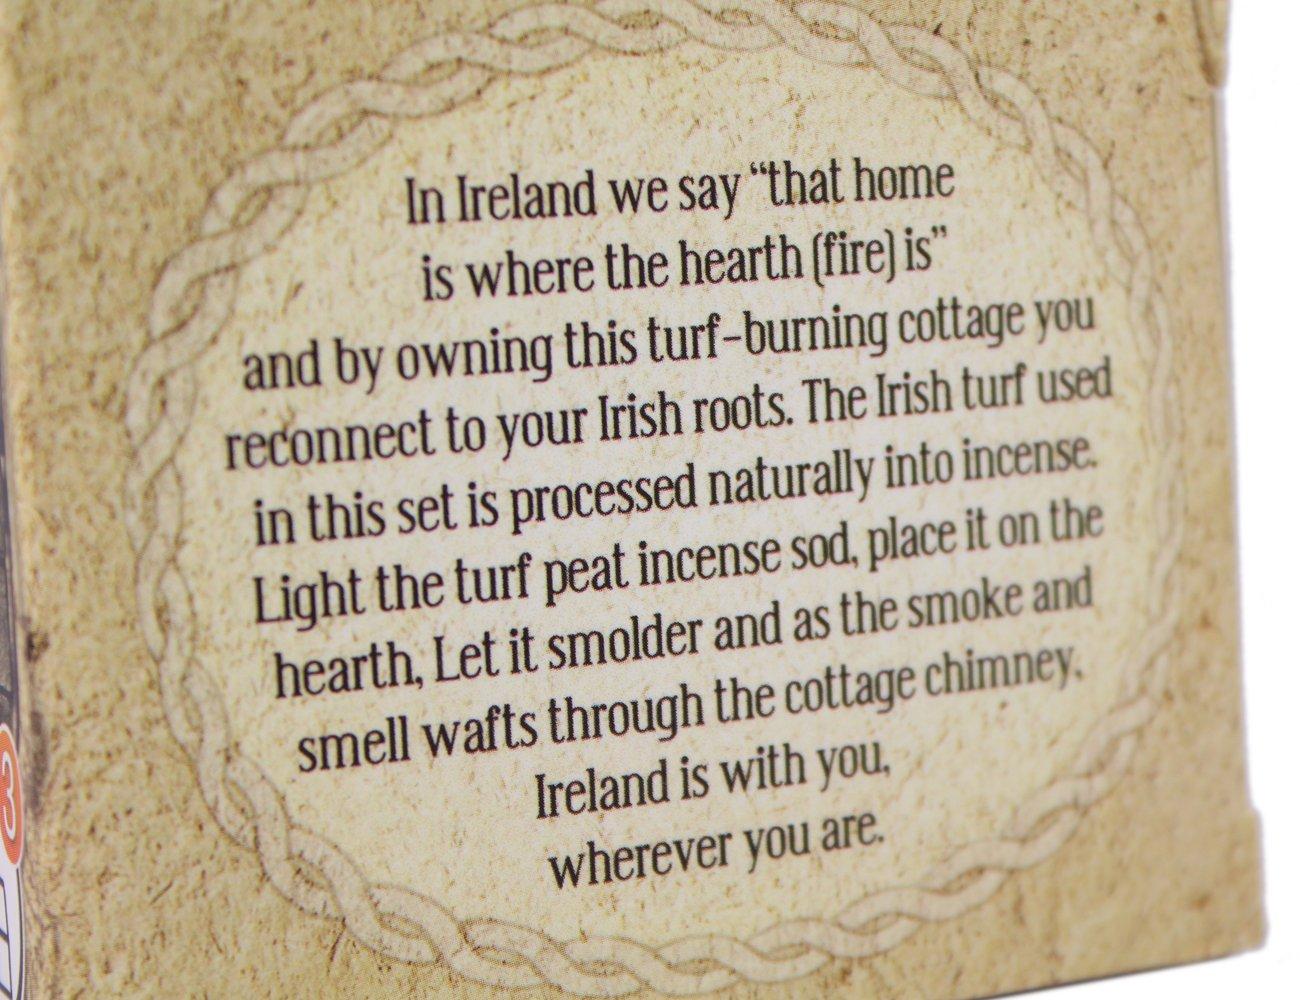 Biddy Murphy Irish Peat Turf Incense Burner Ceramic Cottage Irish Christmas Stone Hearth & Incense Sods Included Housewarming Made in Ireland by Biddy Murphy (Image #6)